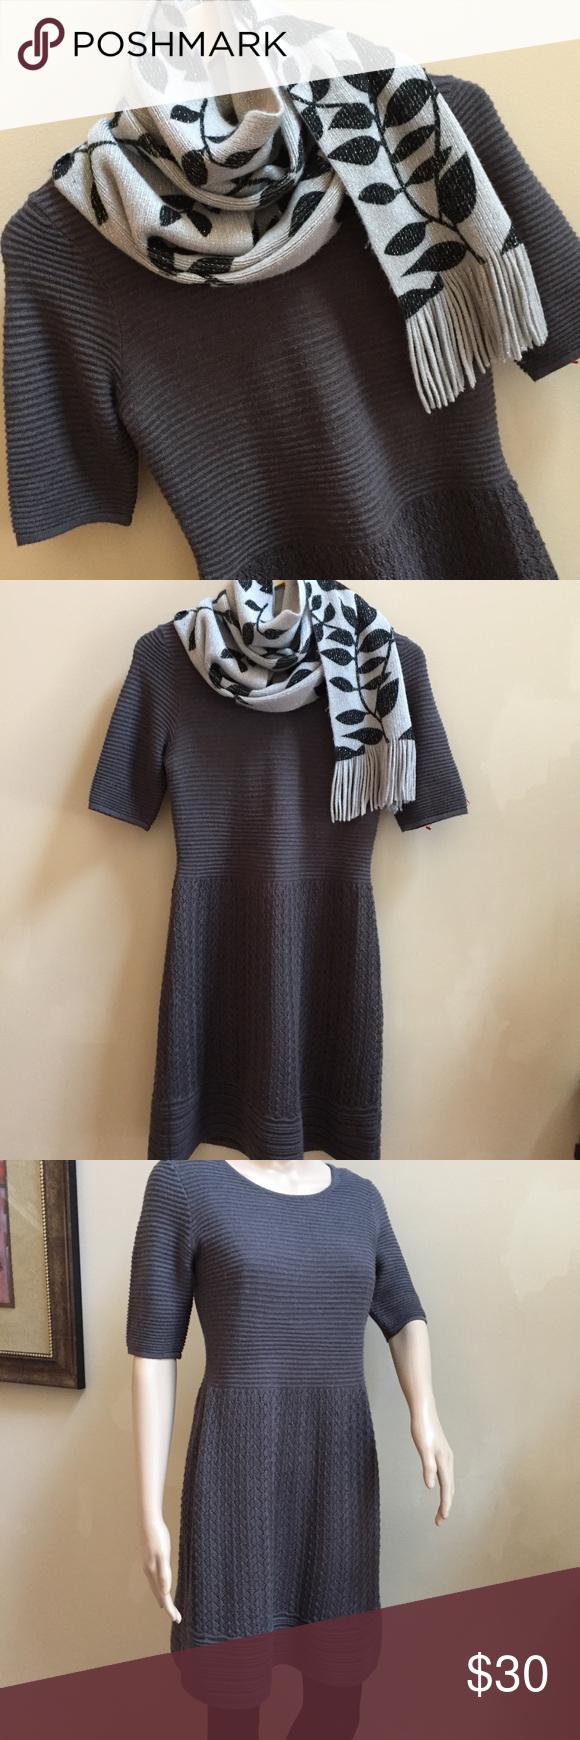 5895fe389f5 Cynthia Rowley Sweater Dress Gorgeous CR dress